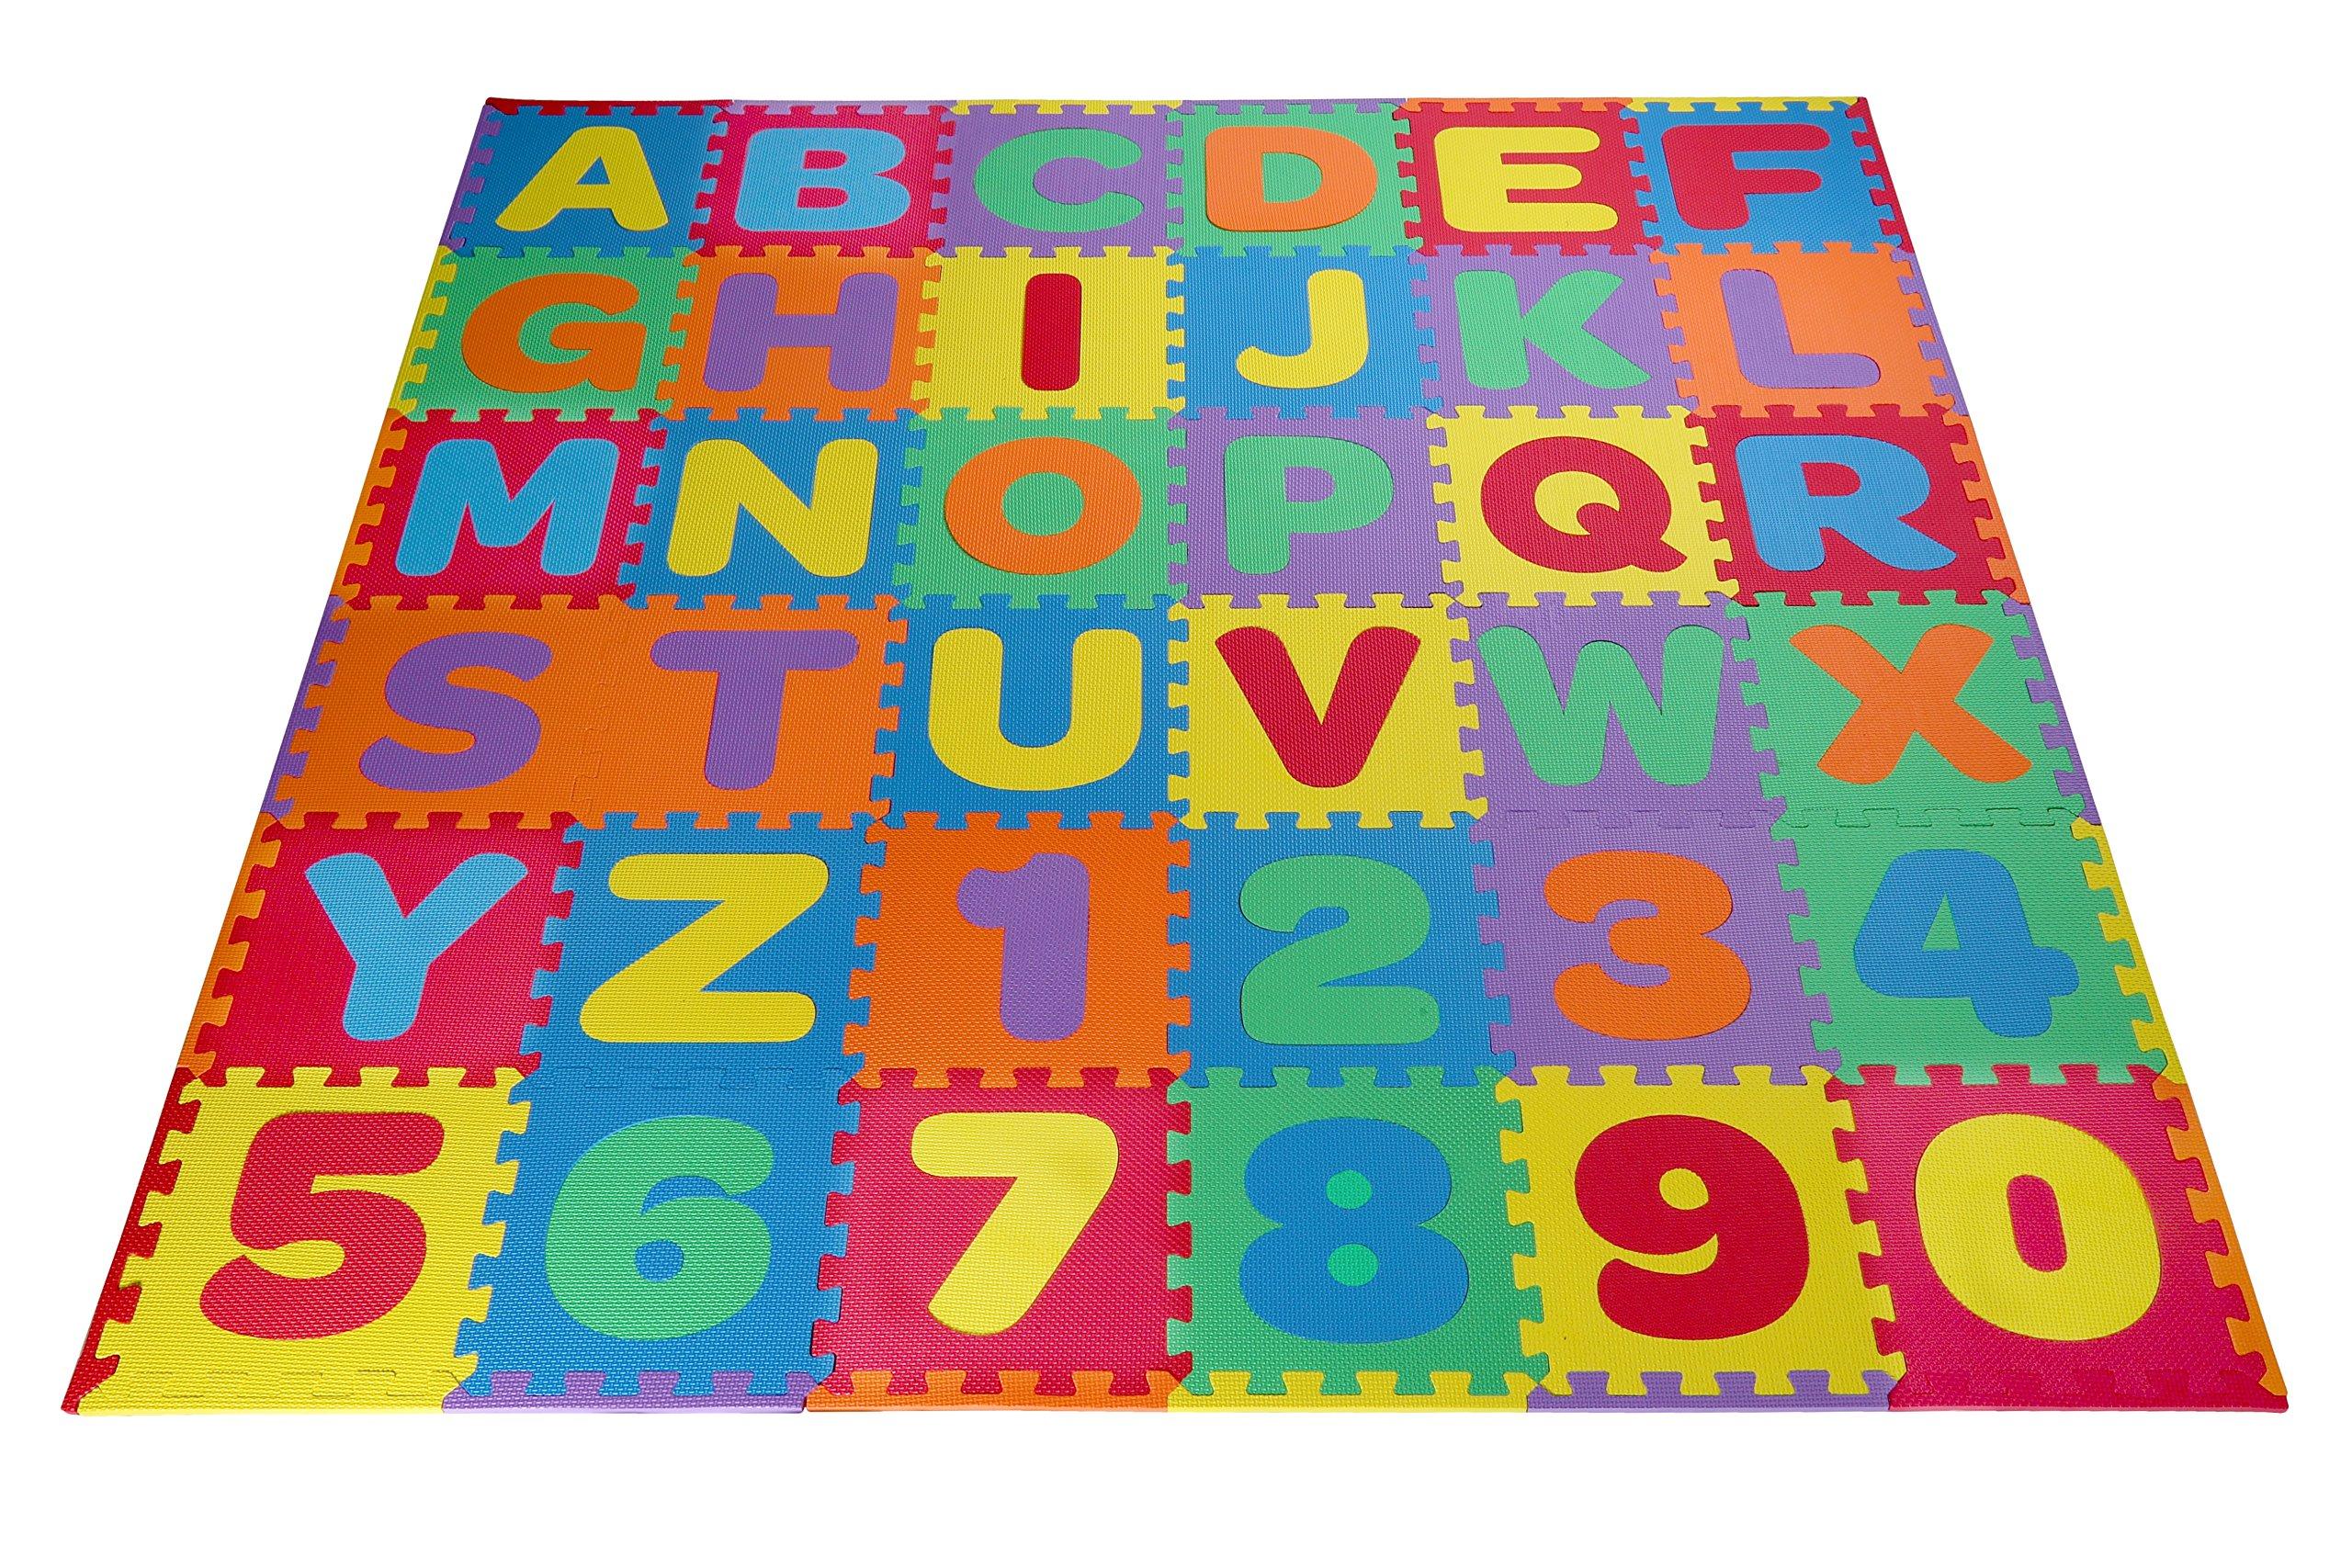 Toydaloo Eva Kids Foam Play, Alphabet ABC Plus Numbers Puzzle Mat, Plus 24 Border Edges, Includes Reusable Carrying Bag with Handle, 36 Piece